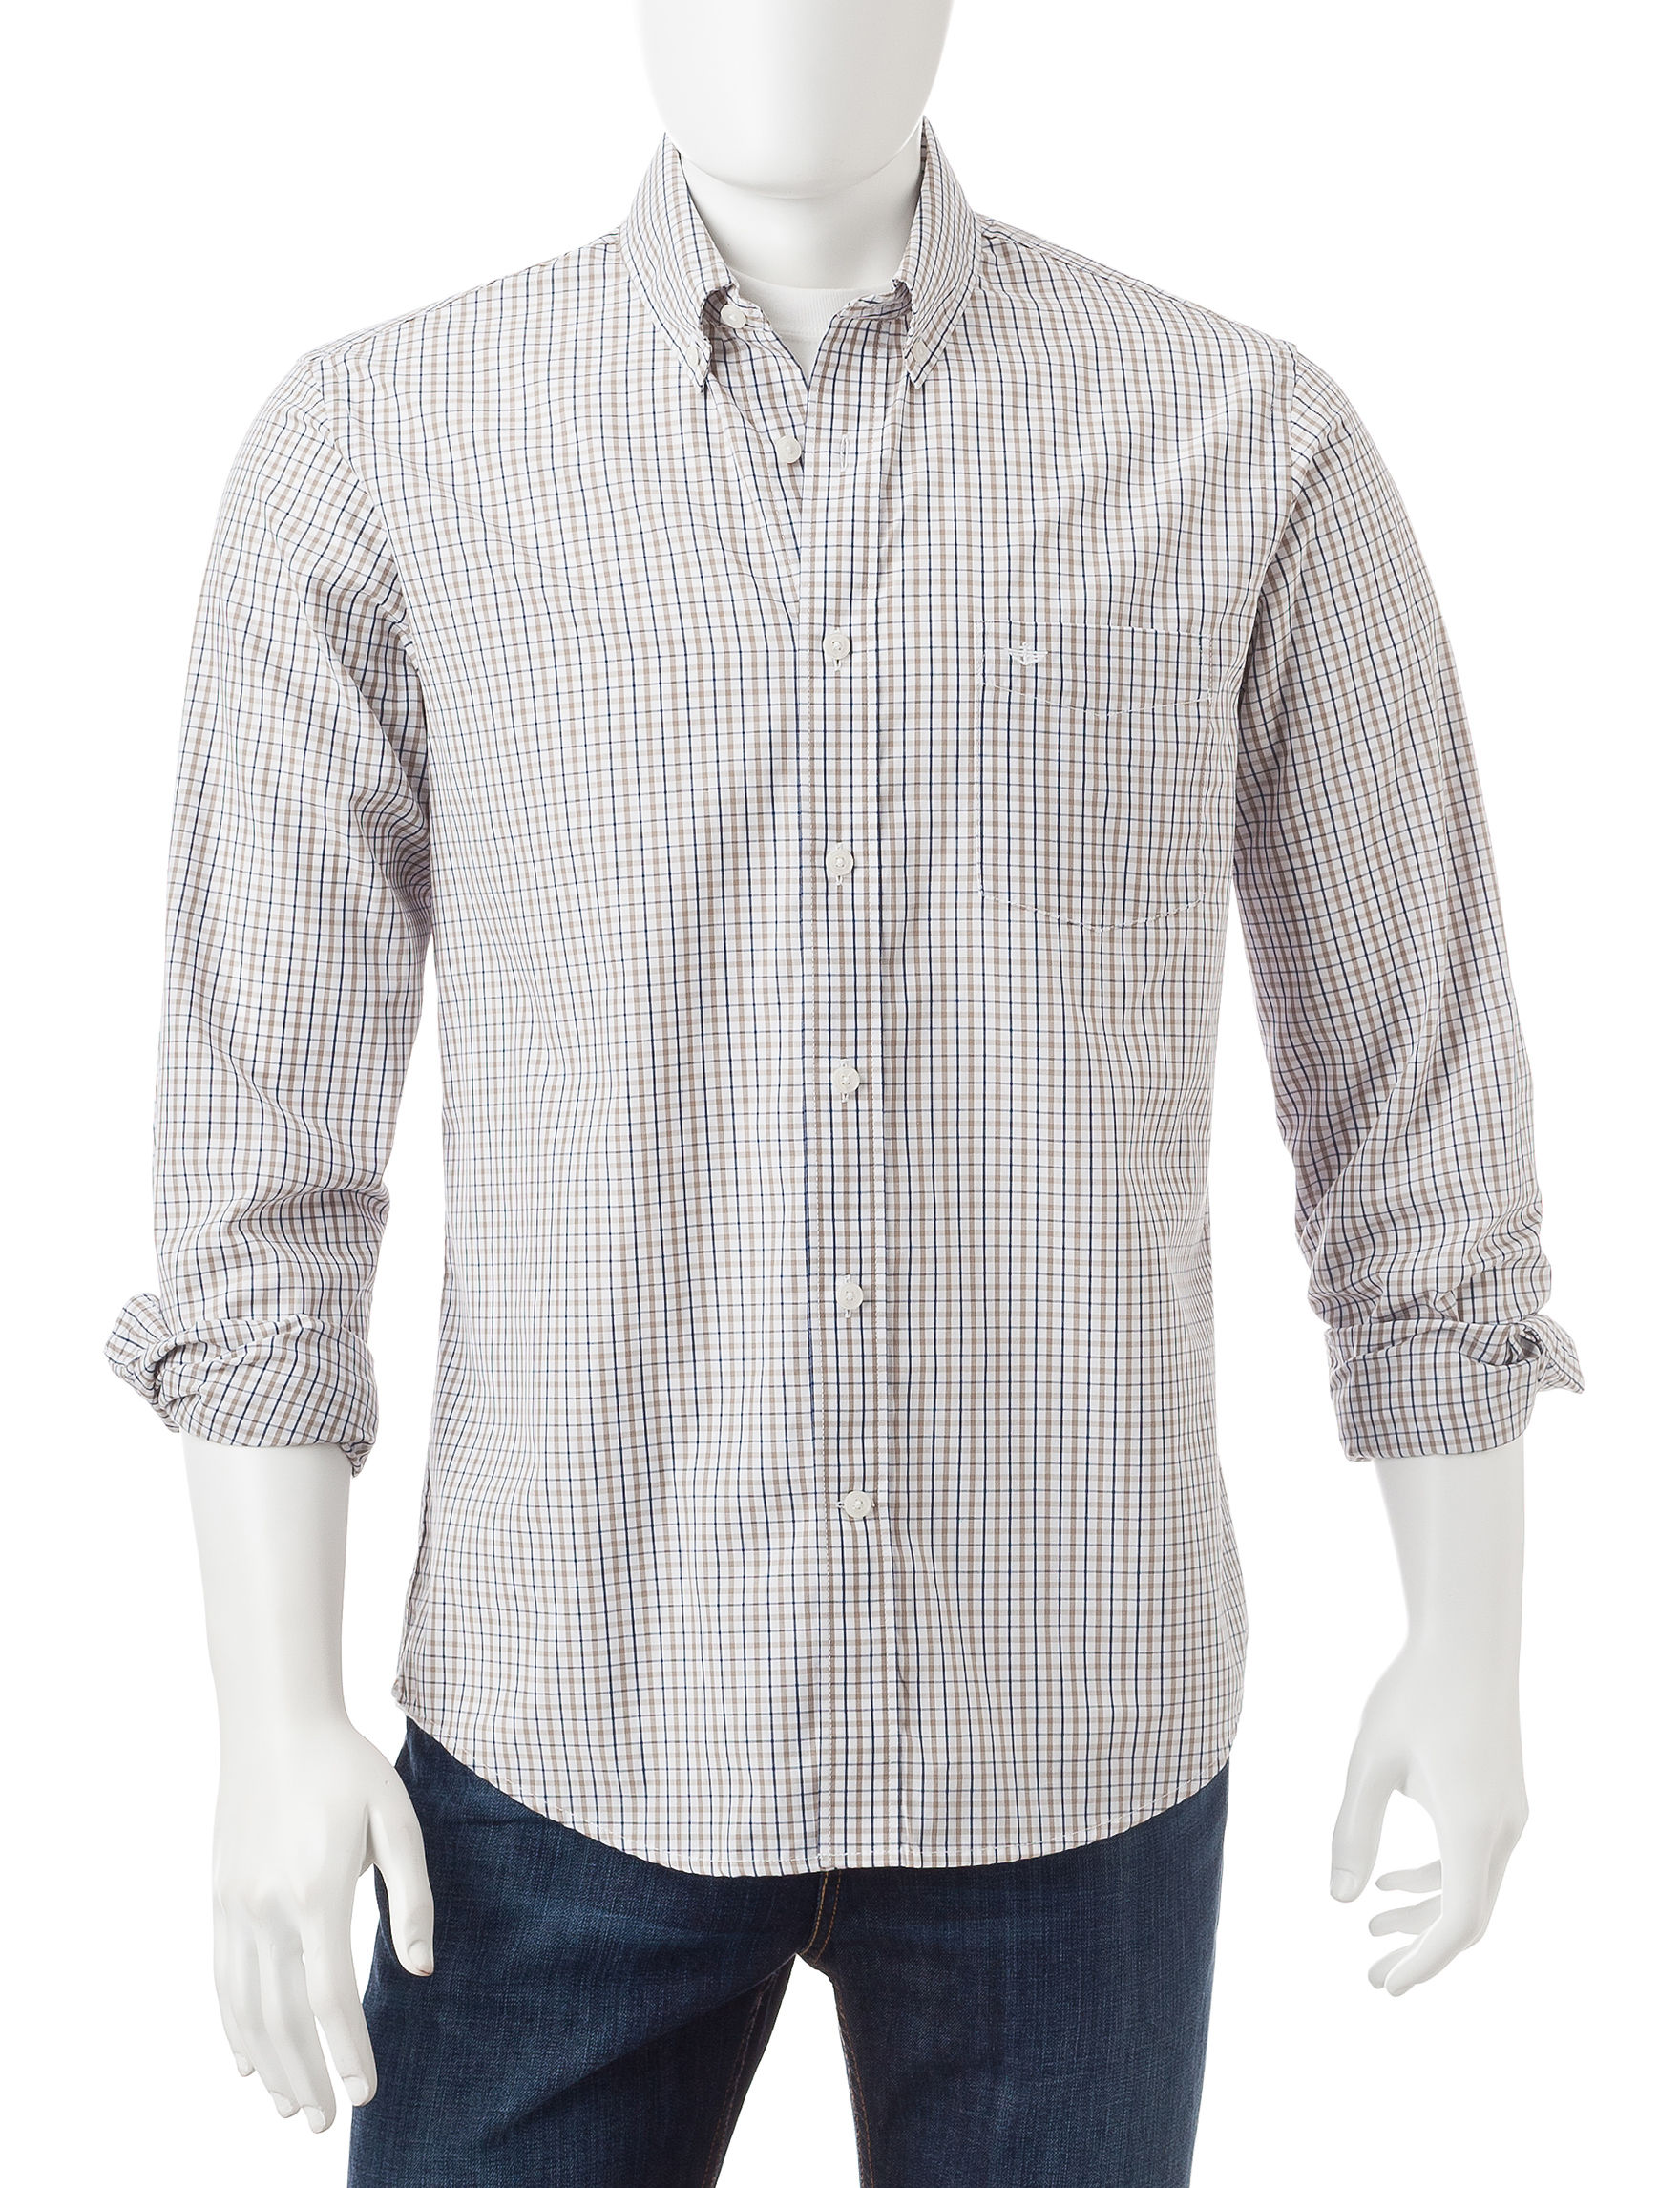 Dockers Timberwolf Casual Button Down Shirts